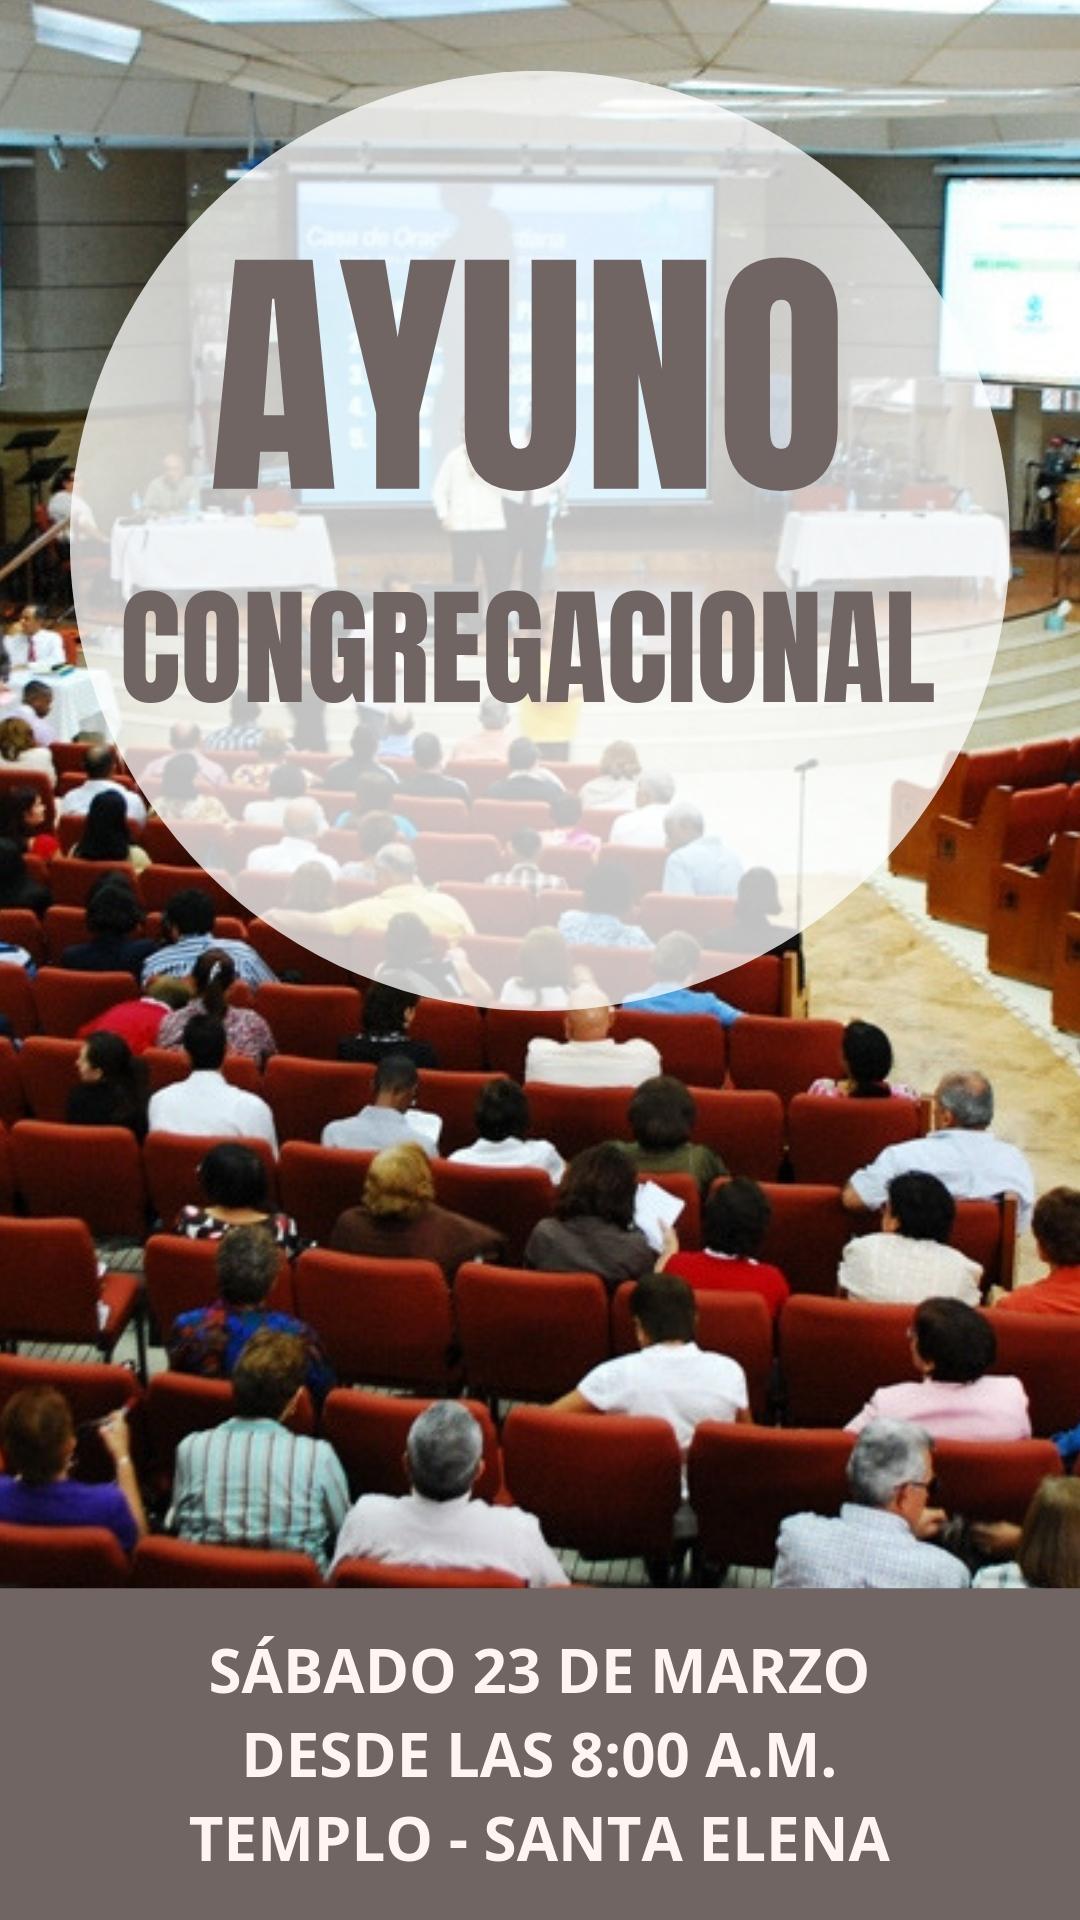 Ayuno Congregacional 2019